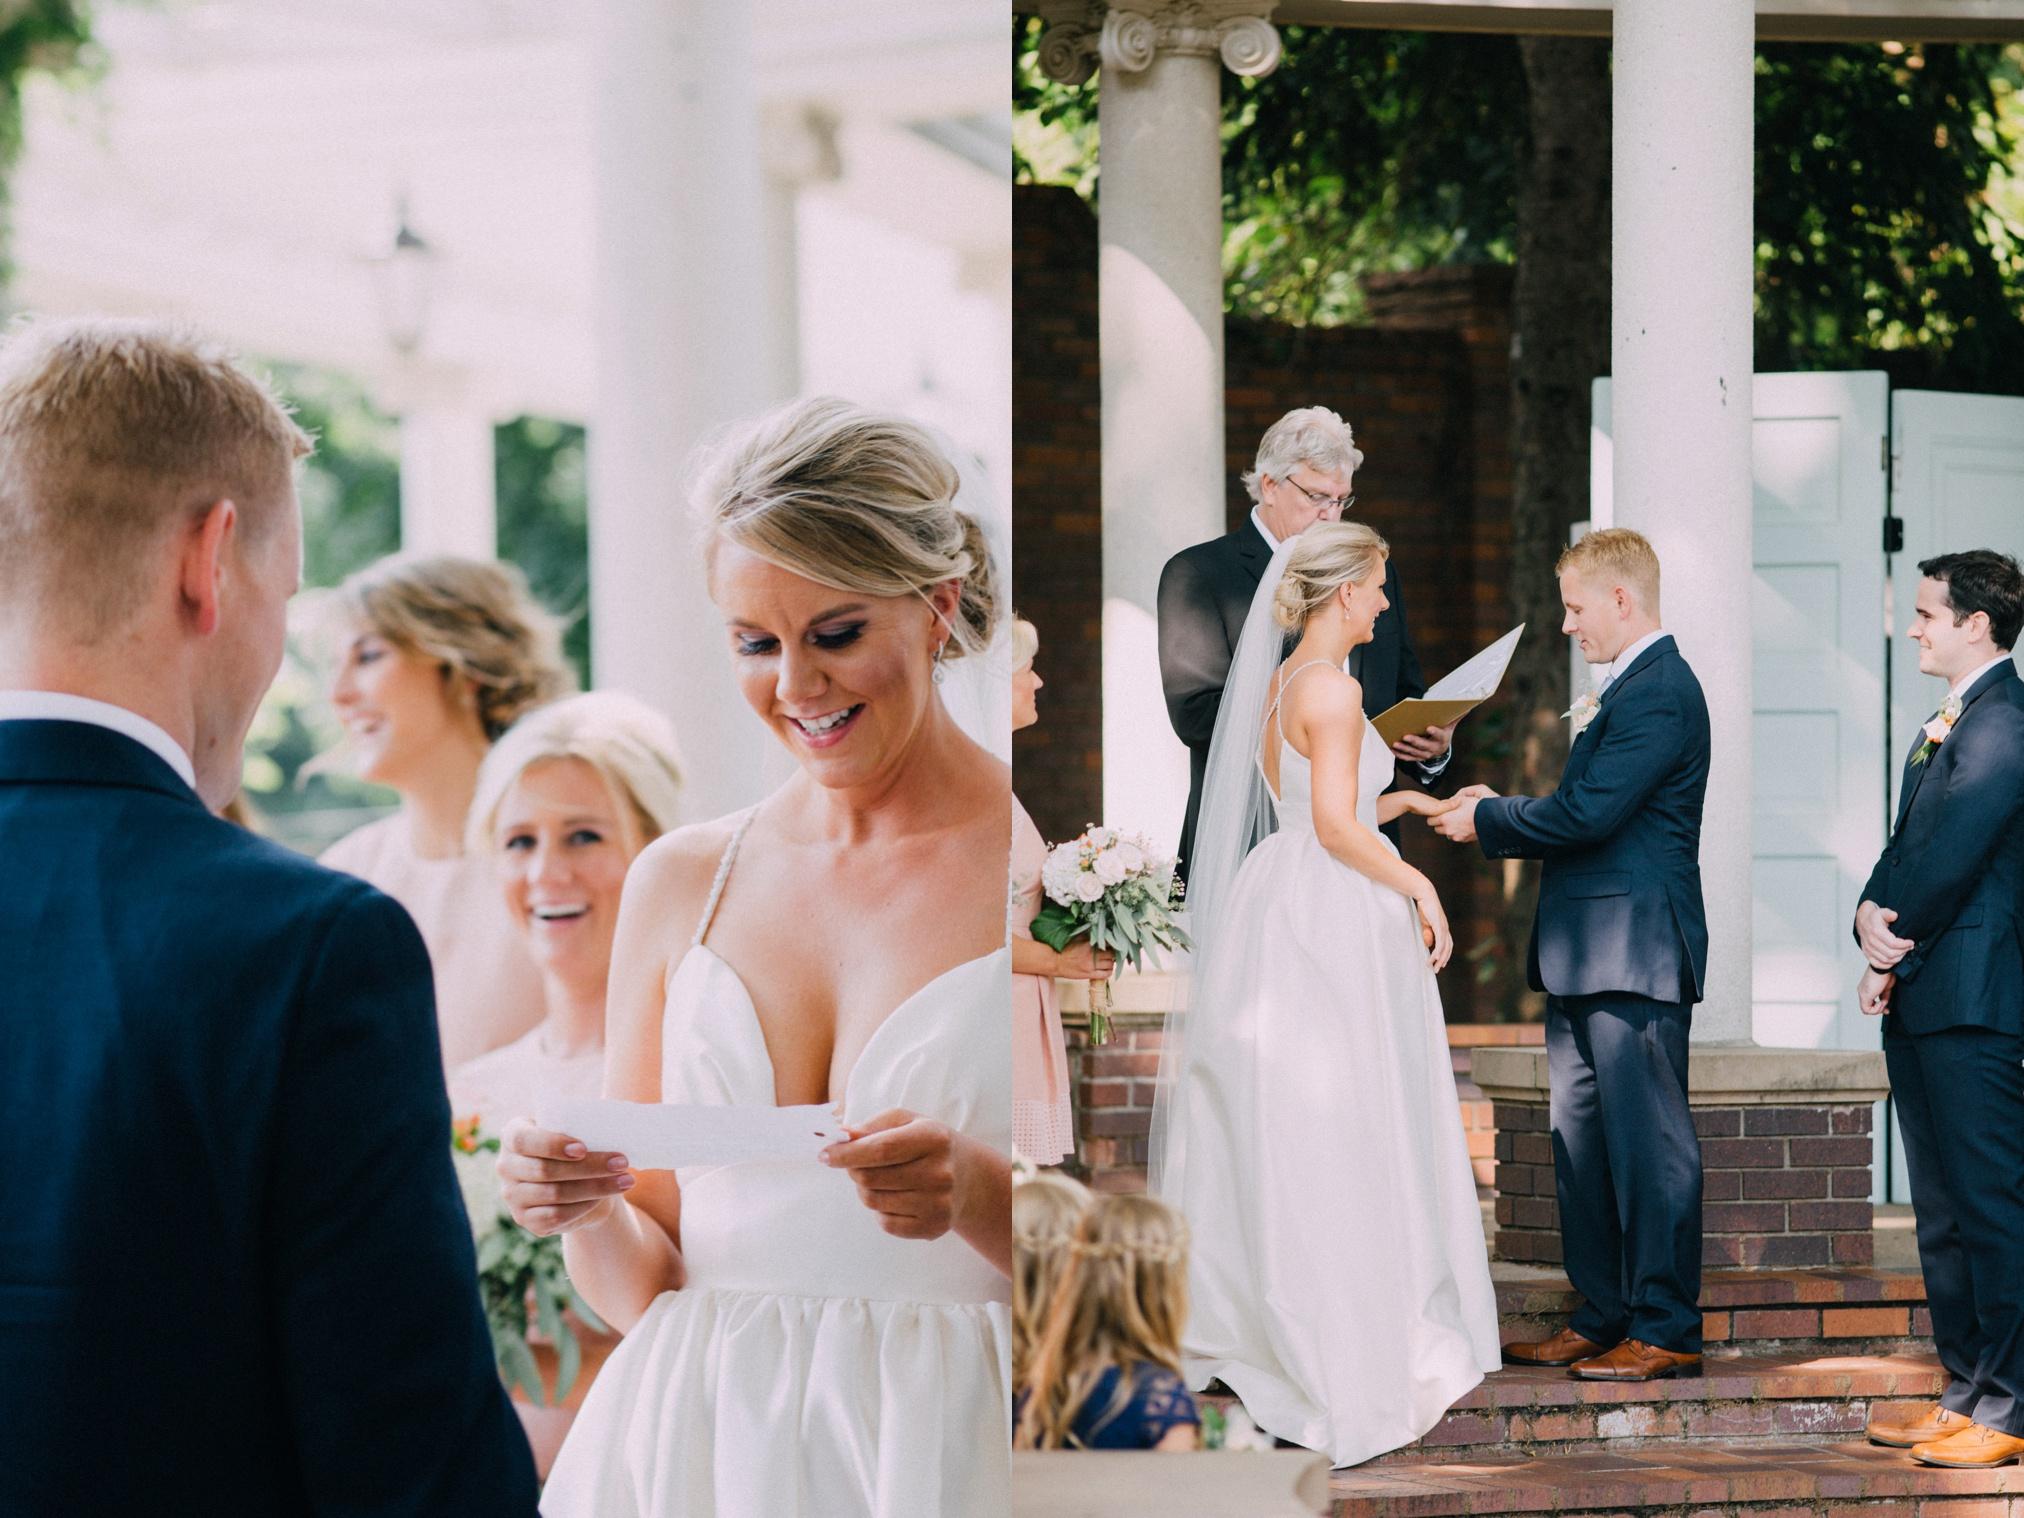 brenna+michael_wedding-424.jpg